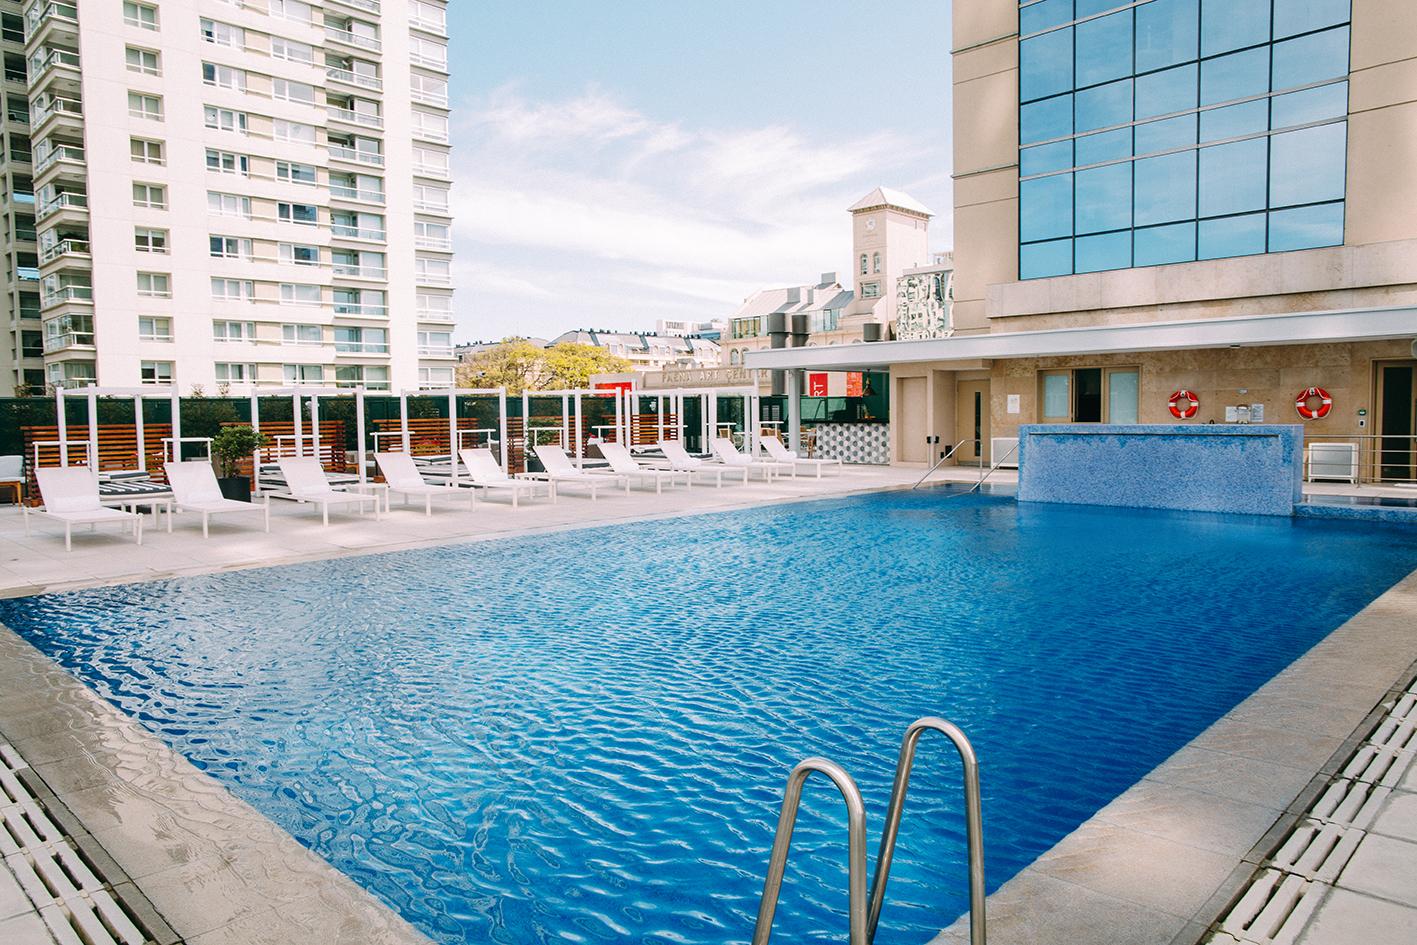 Pool at Alvear Icon Apartments